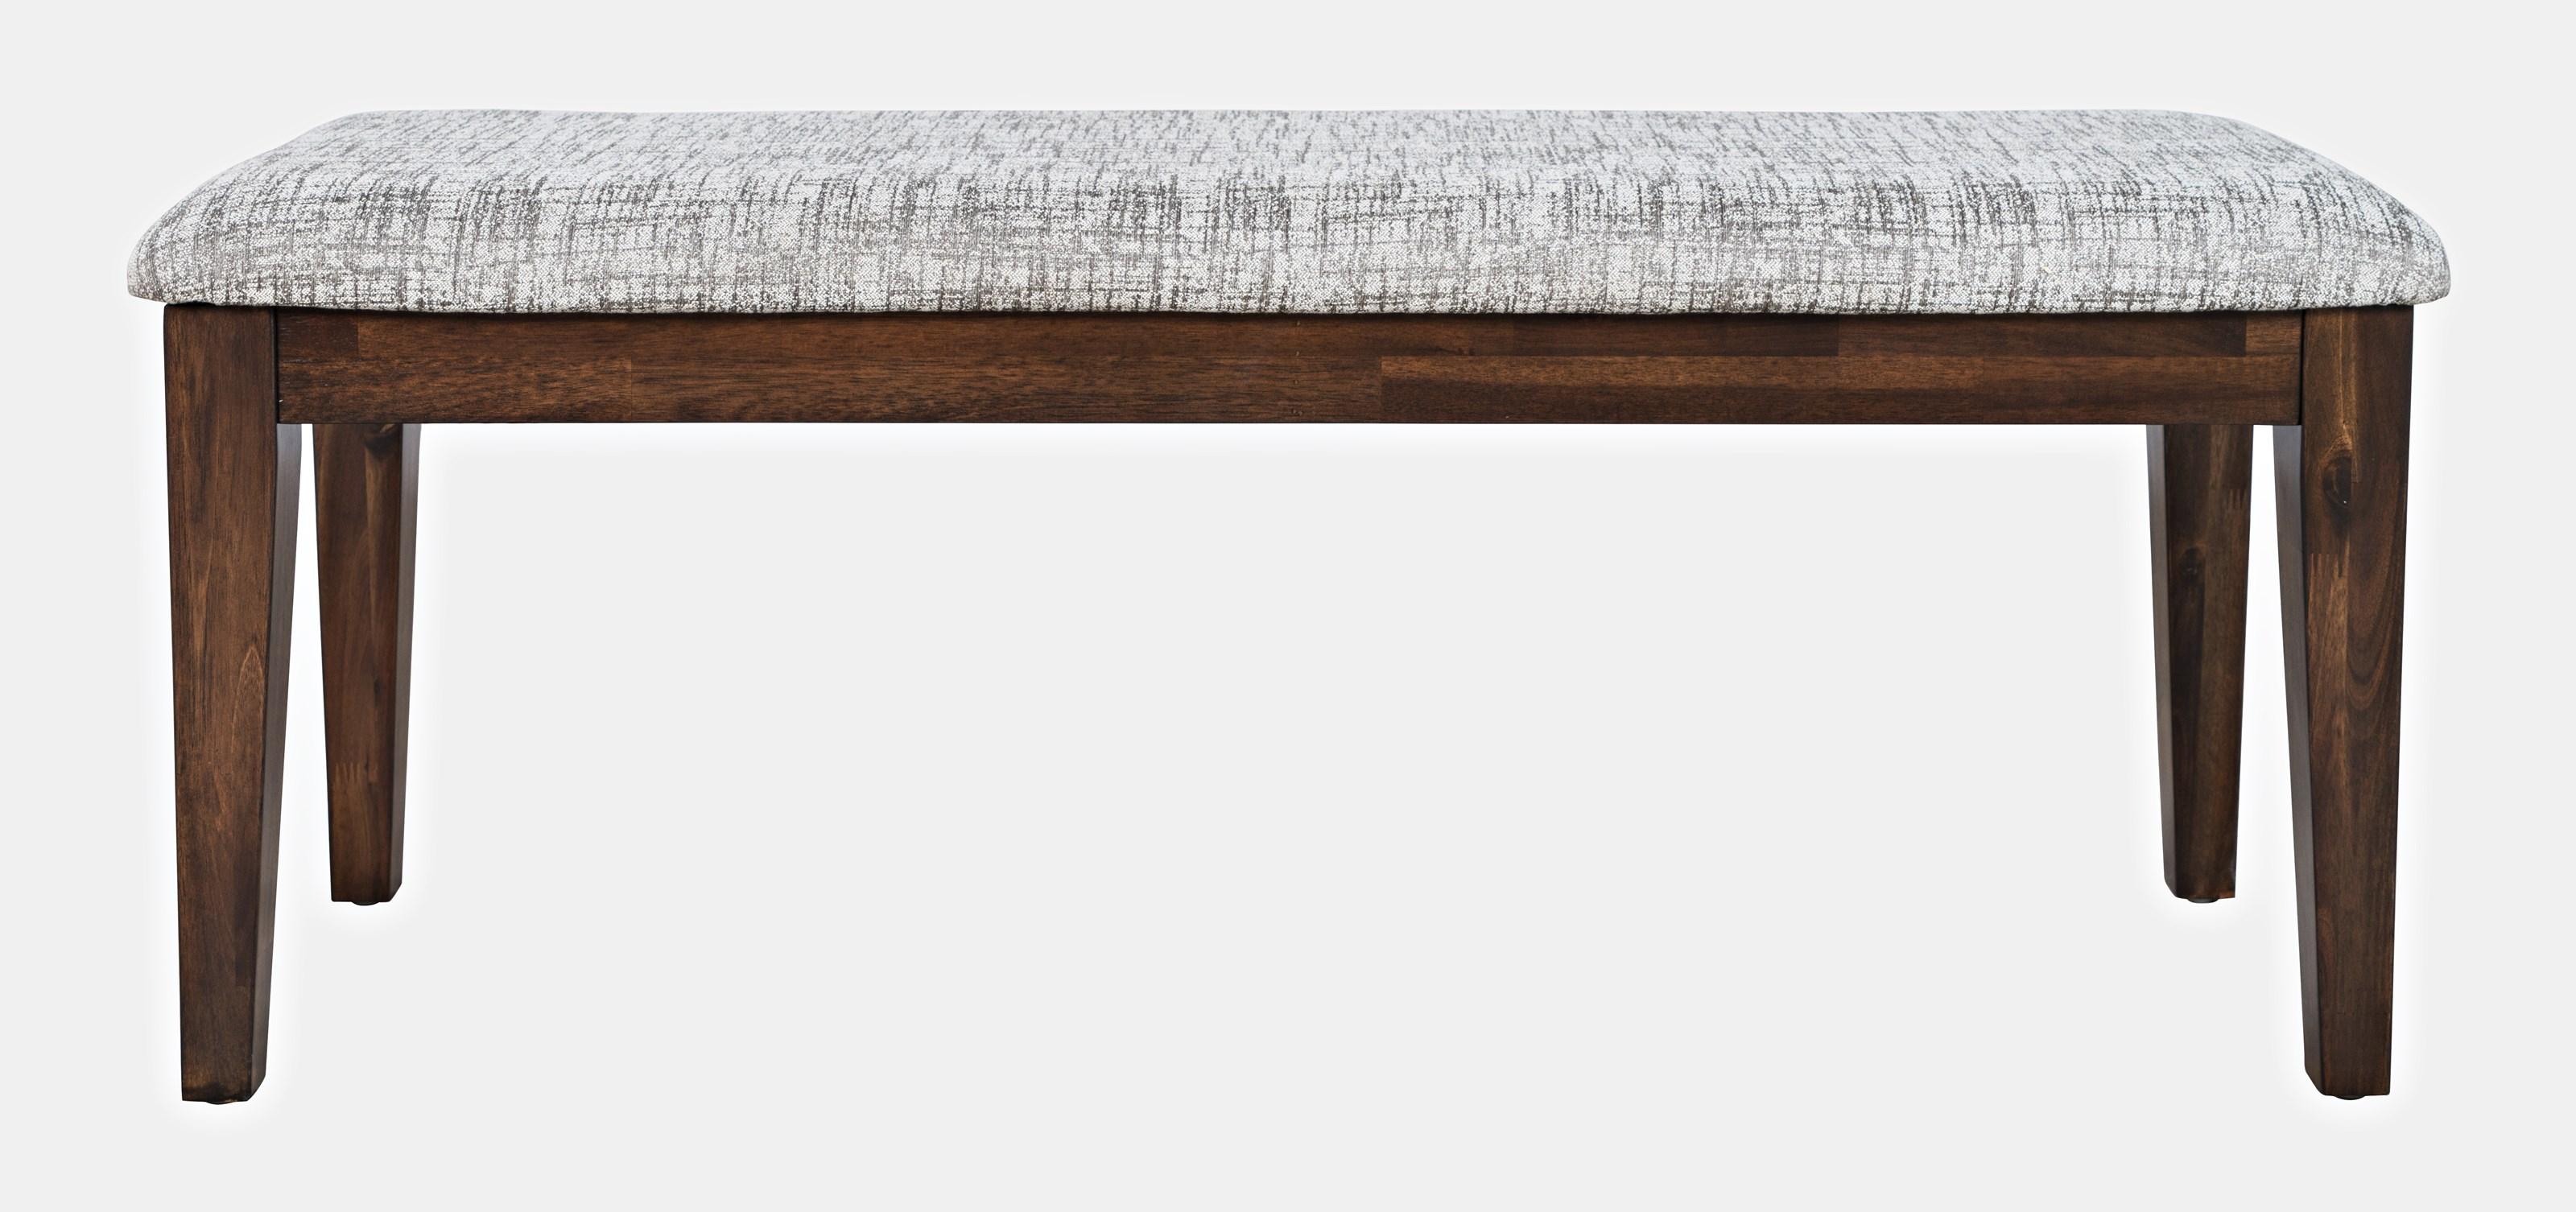 Urban Icon Upholstered Bench by Jofran at Jofran